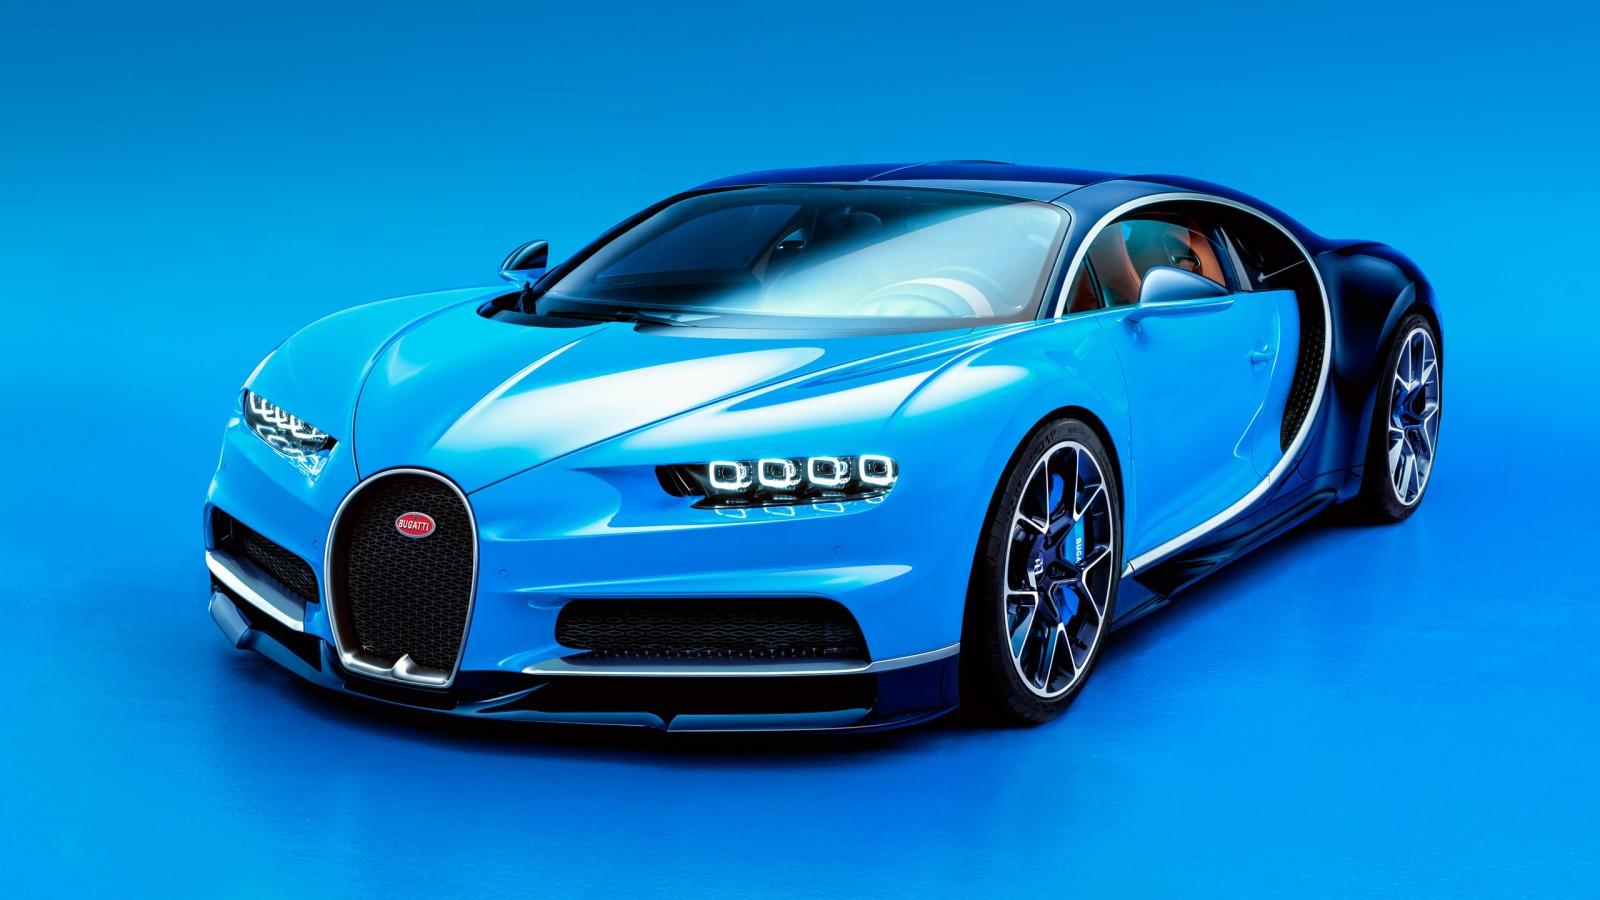 2016 Bugatti Chiron Wallpaper Hd Car Wallpapers Id 6280